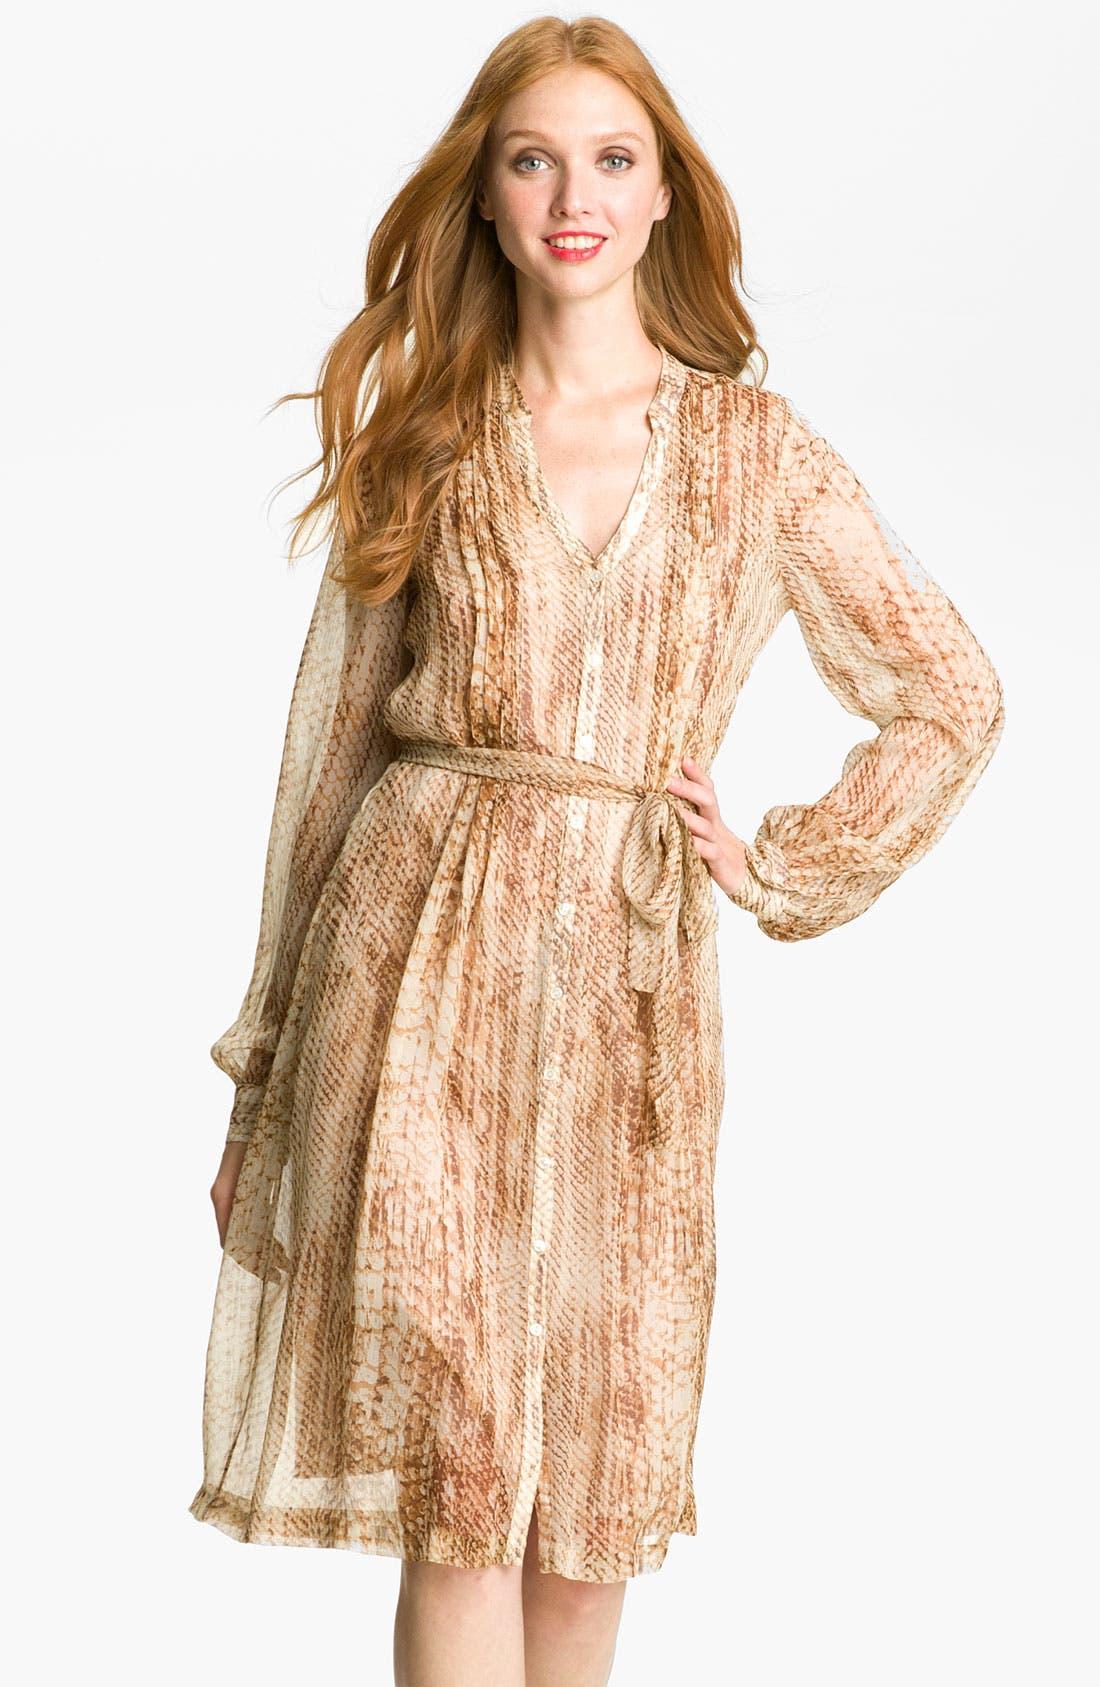 Alternate Image 1 Selected - Lucky Brand 'Snakes Eyes' Silk Chiffon Shirtdress